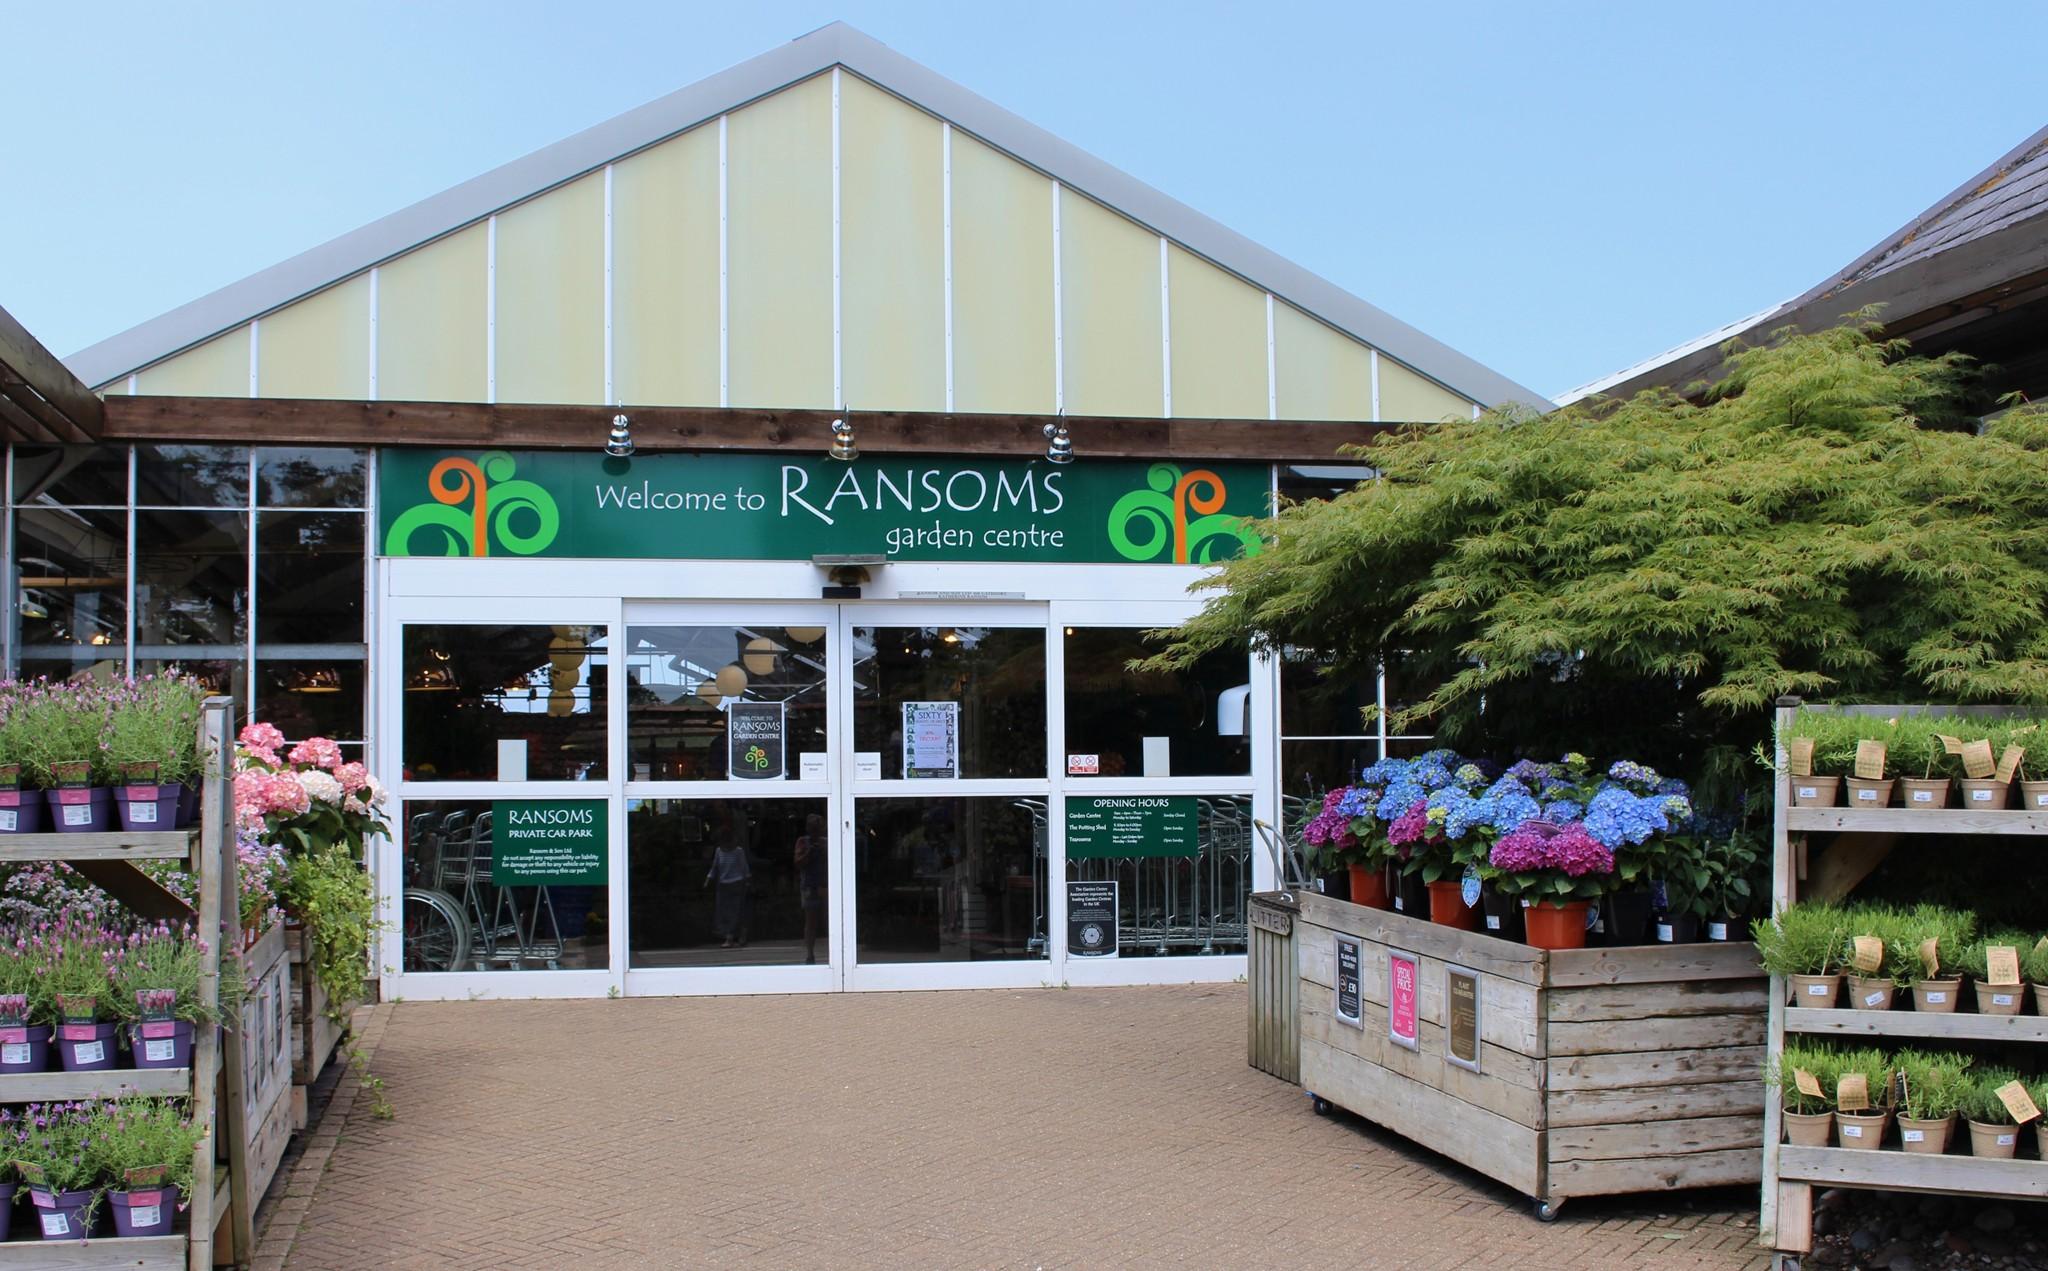 Ransoms Garden Centre